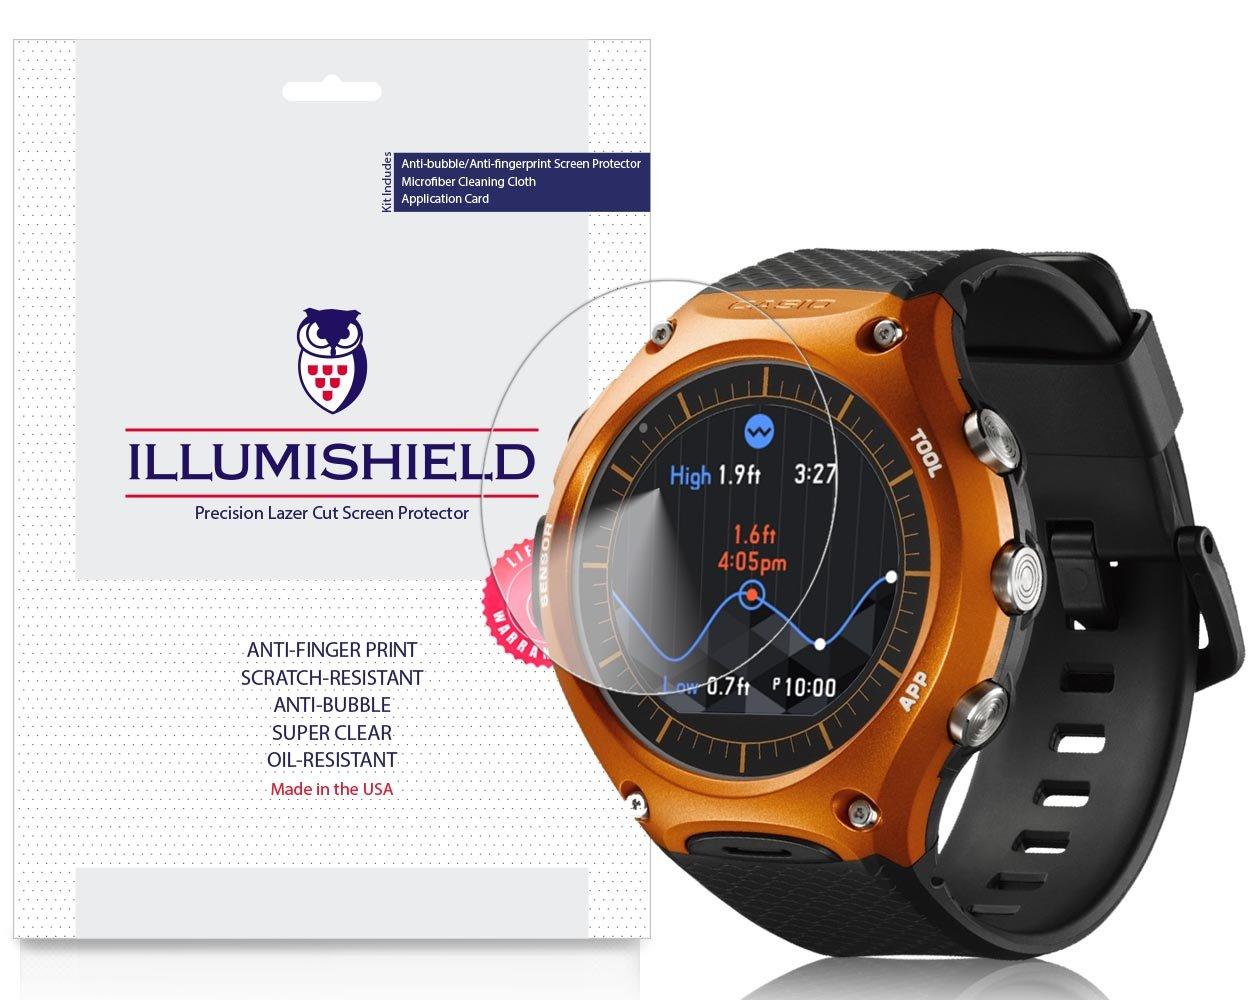 Al aire libre iLLumiShield - Casio inteligente {WSD-F10} reloj Protector de pantalla transparente HD Film japonés con-Hertha y anti-huella - Invisible ...